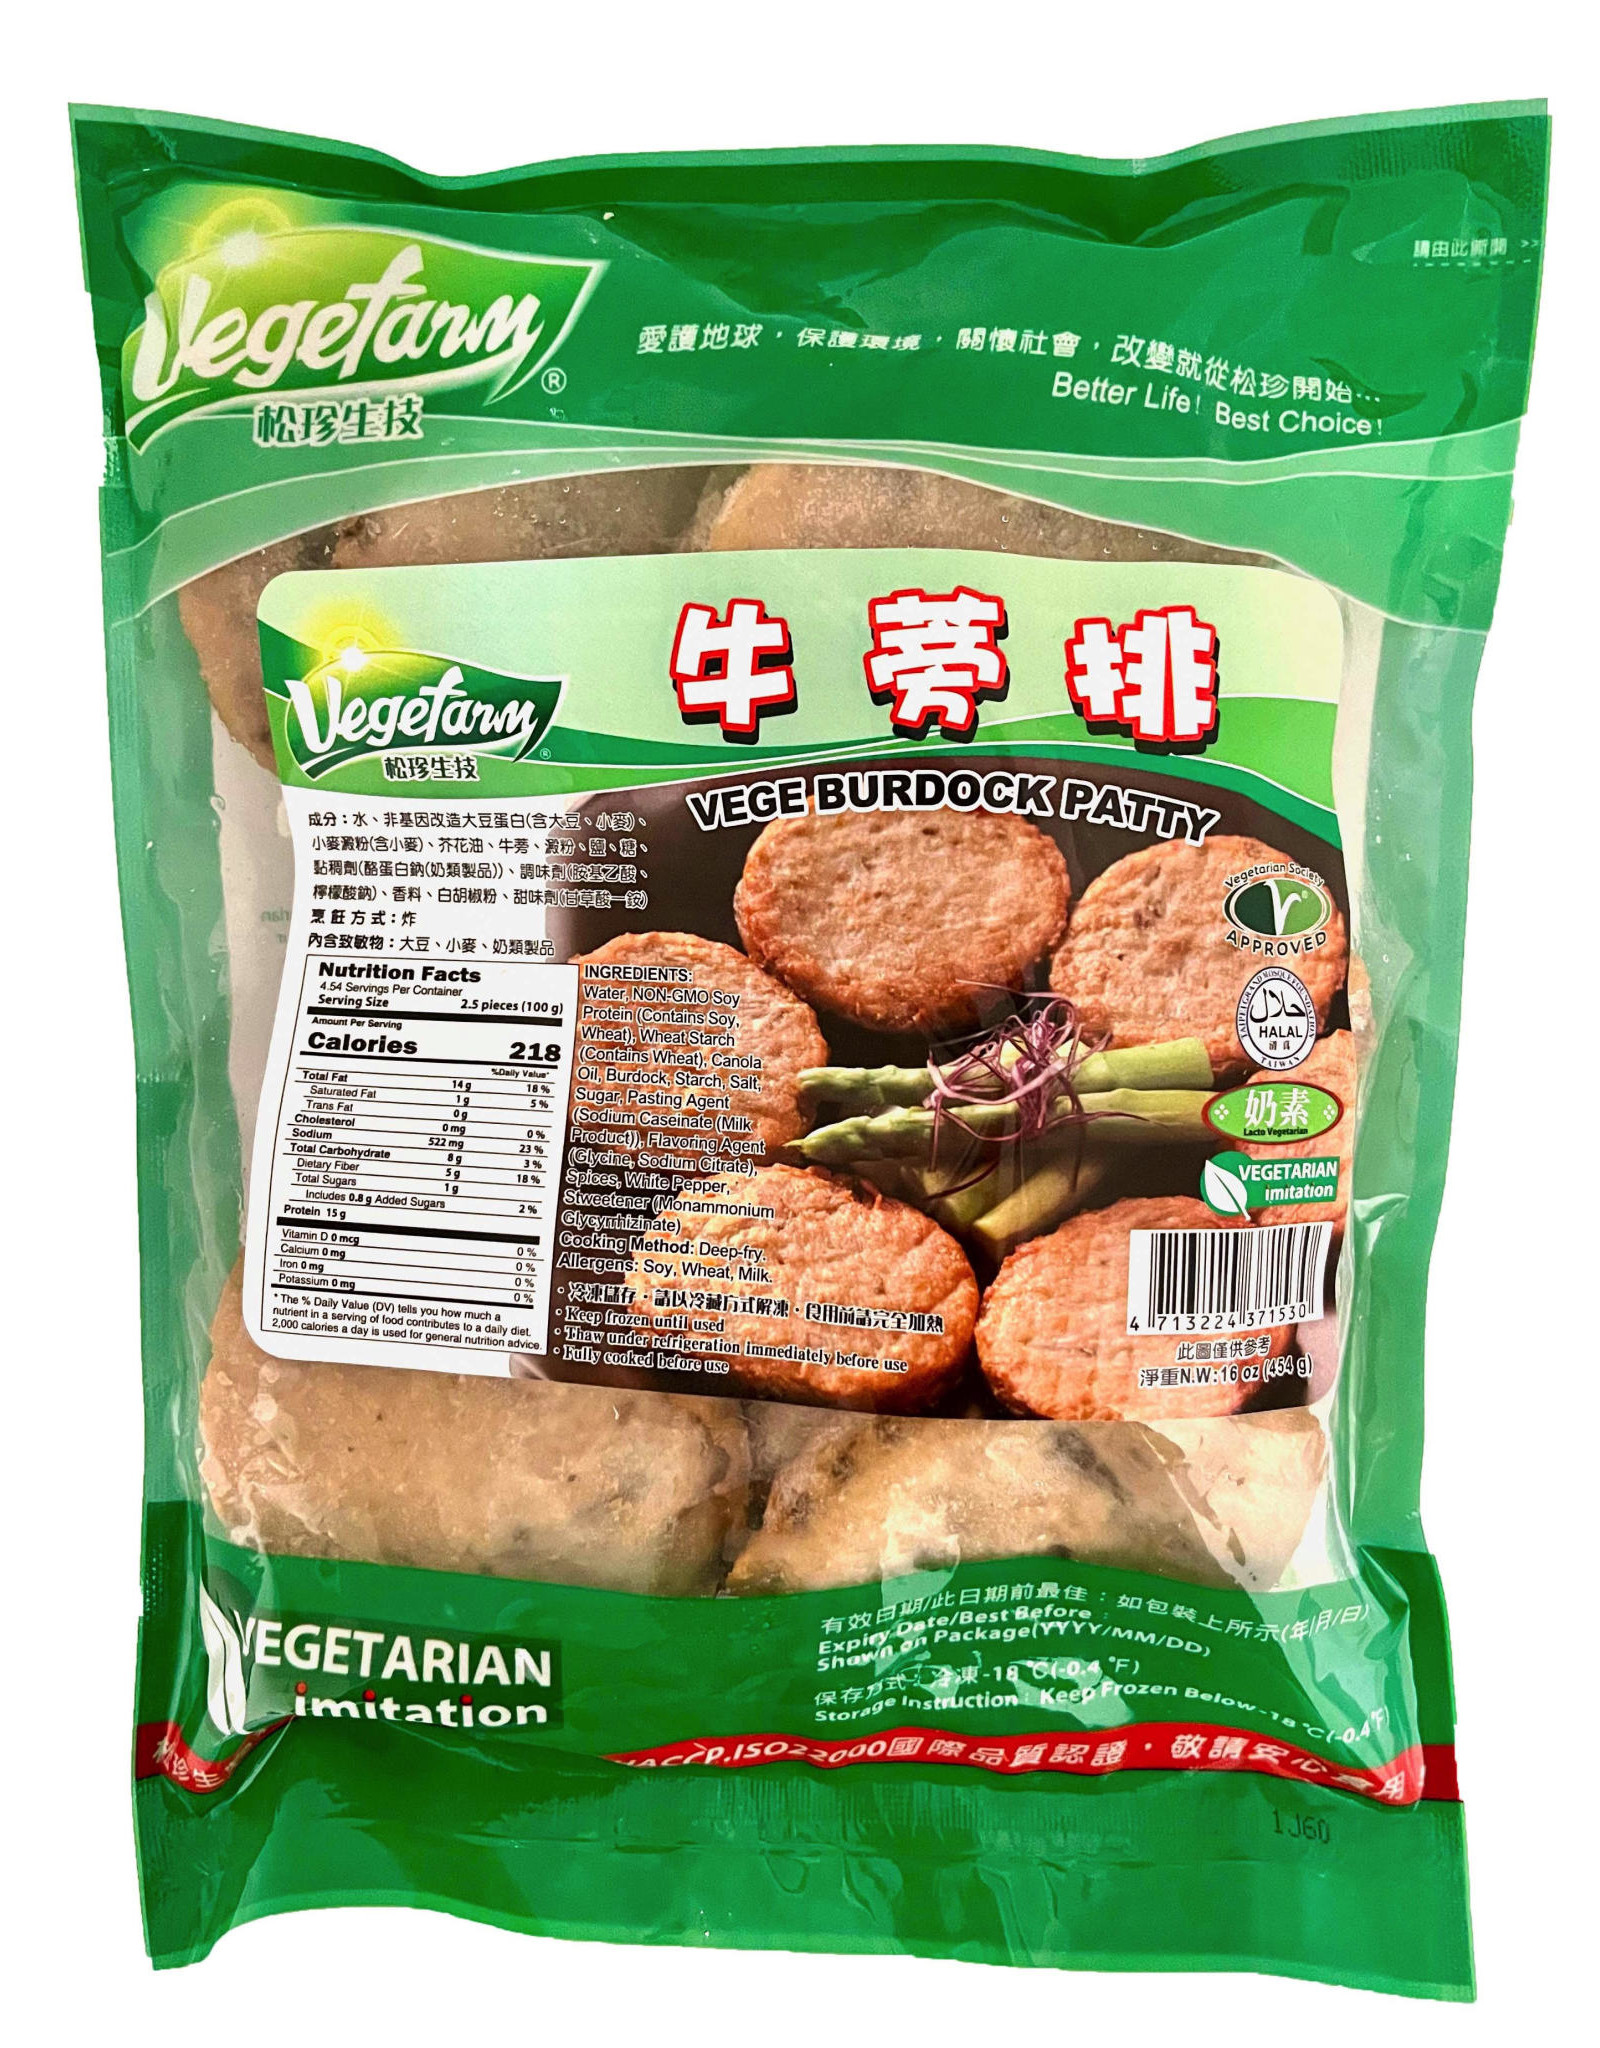 Vegefarm * 松珍 (VF) Vege Burdock Patty (S)*(松珍) 牛蒡排 (S)